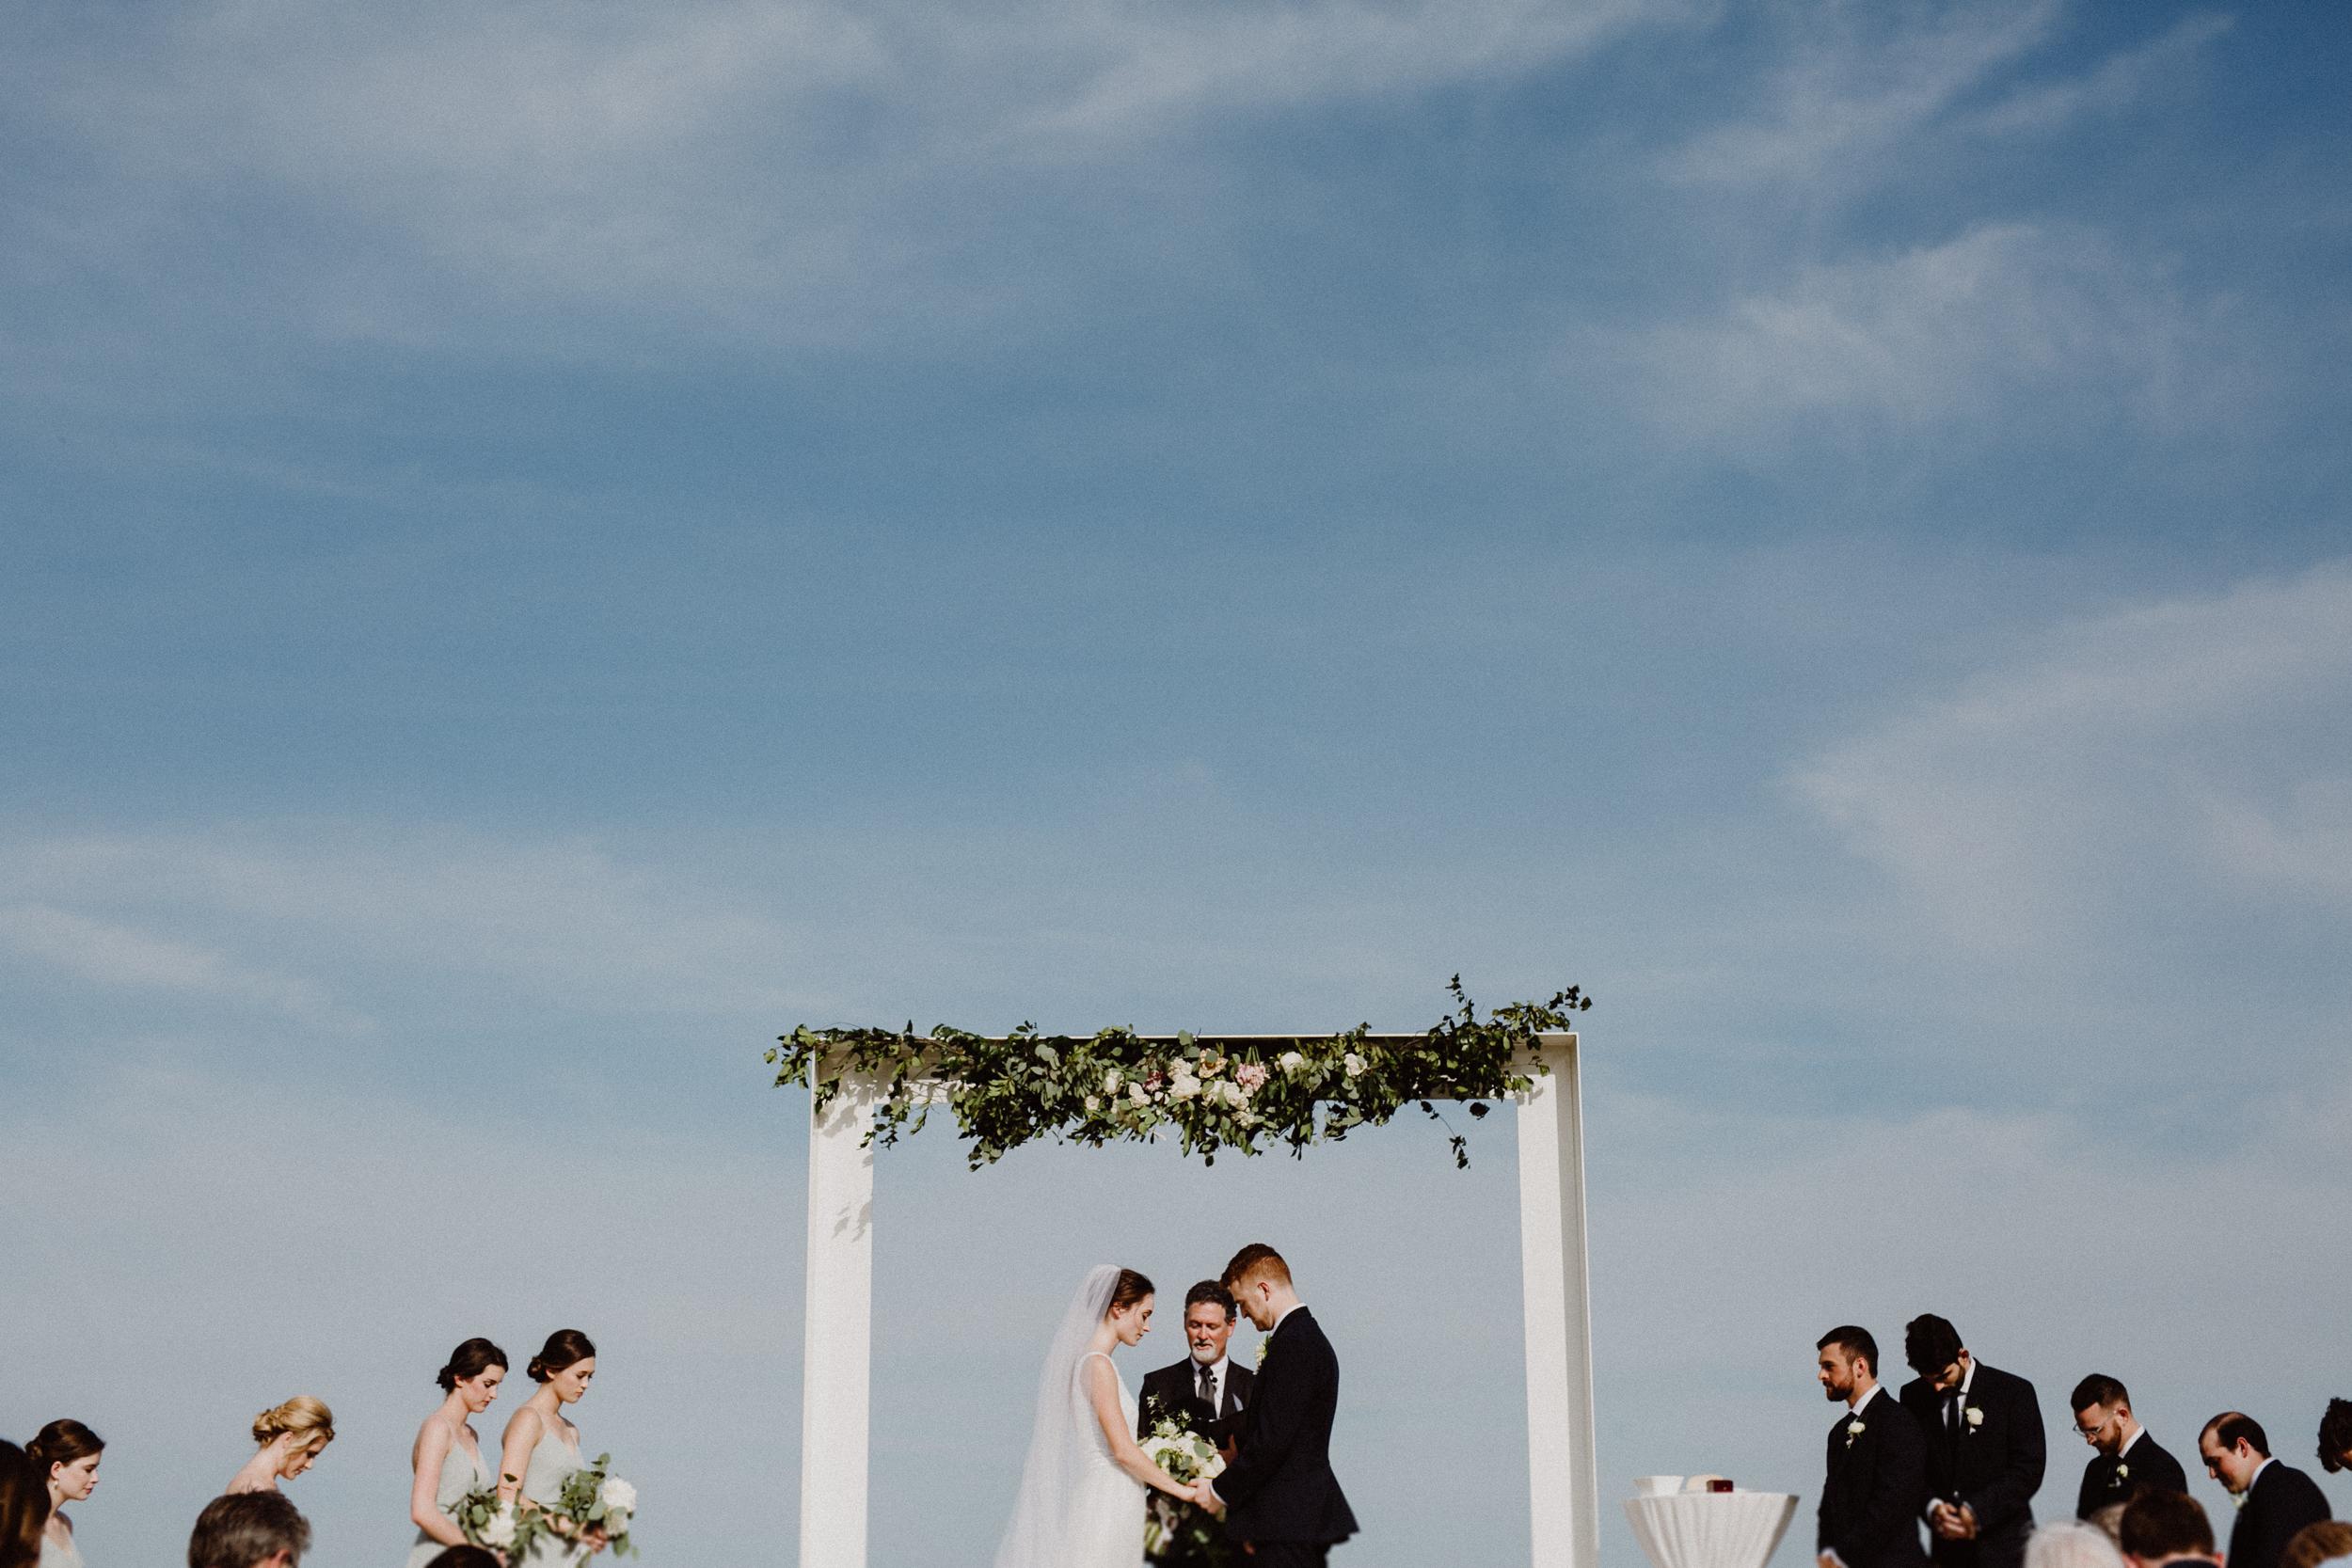 prospect-house-wedding-S&AC-612.jpg